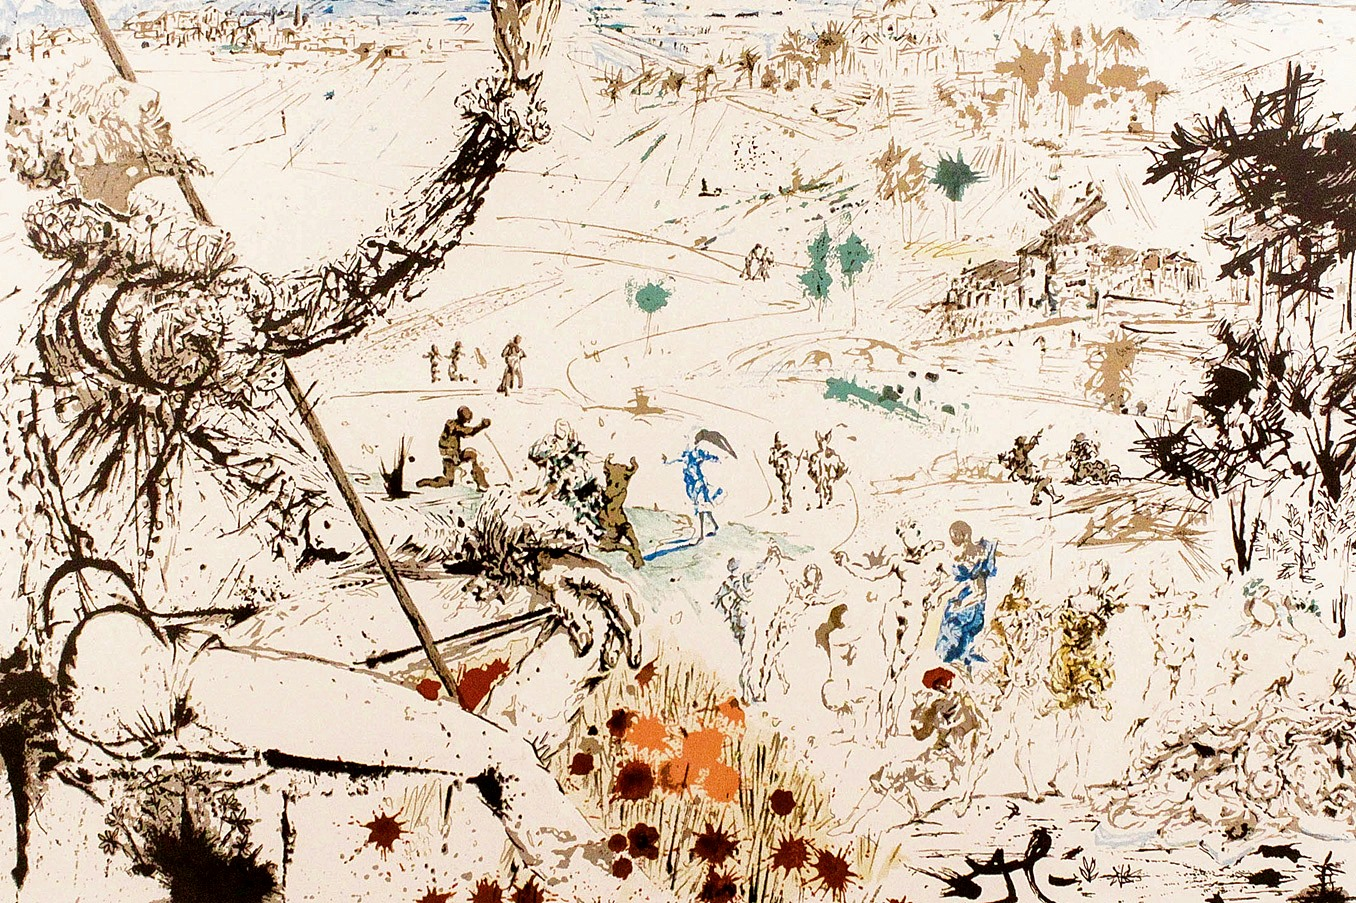 Quijote Salvador Dalí